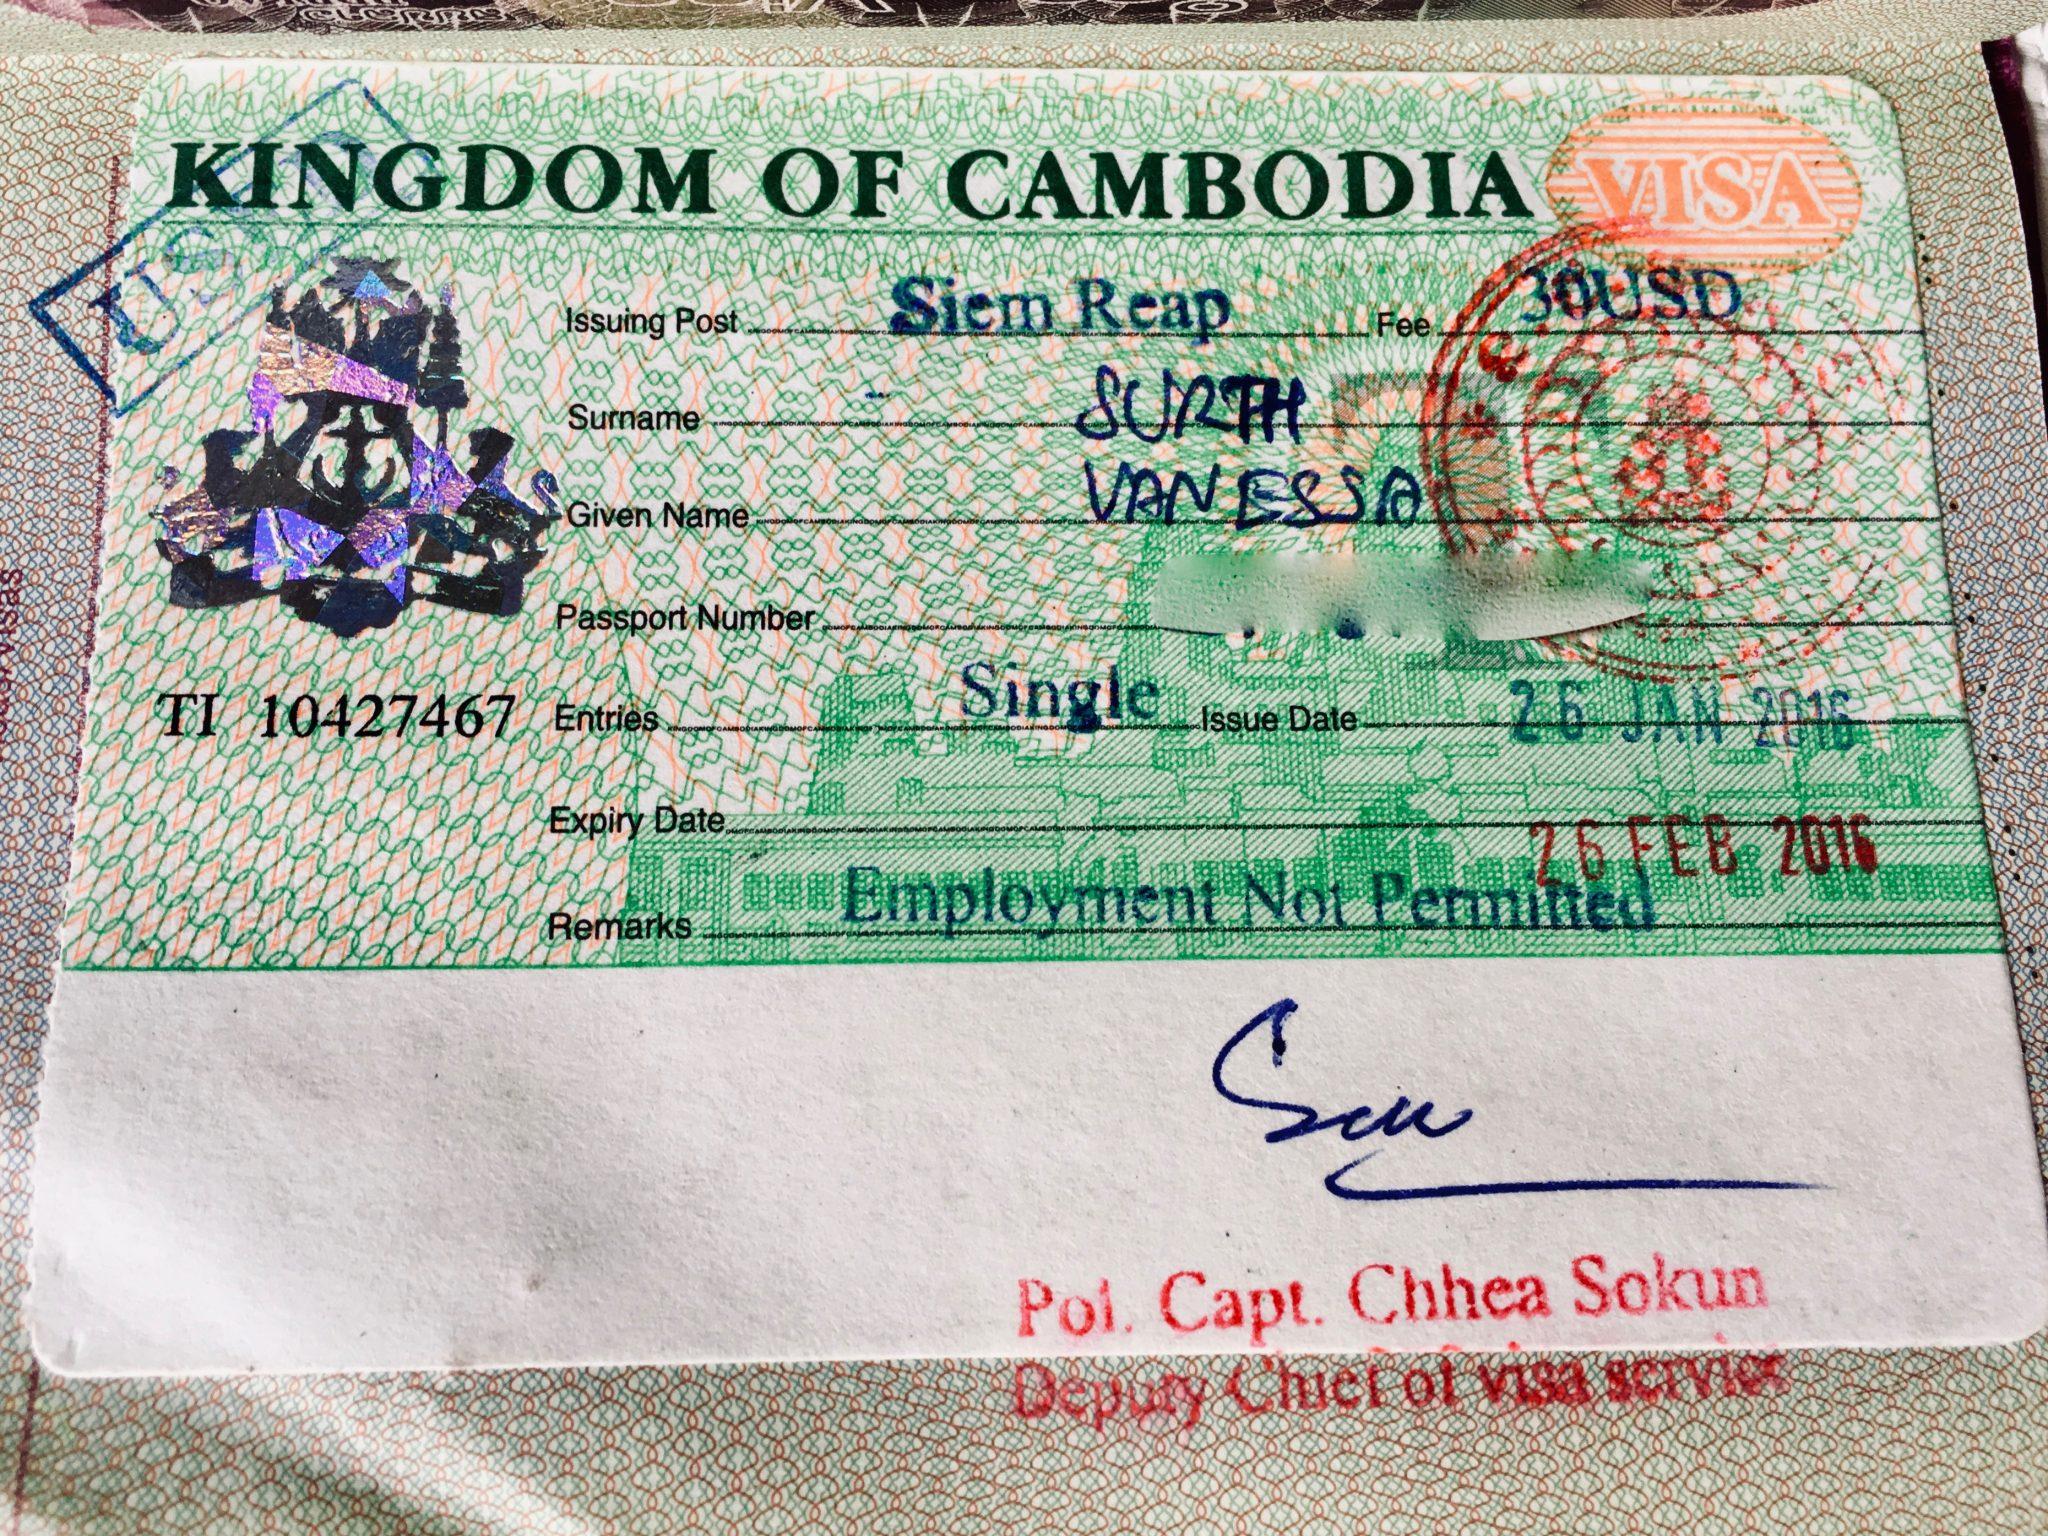 Koh Chang nach Kambodscha